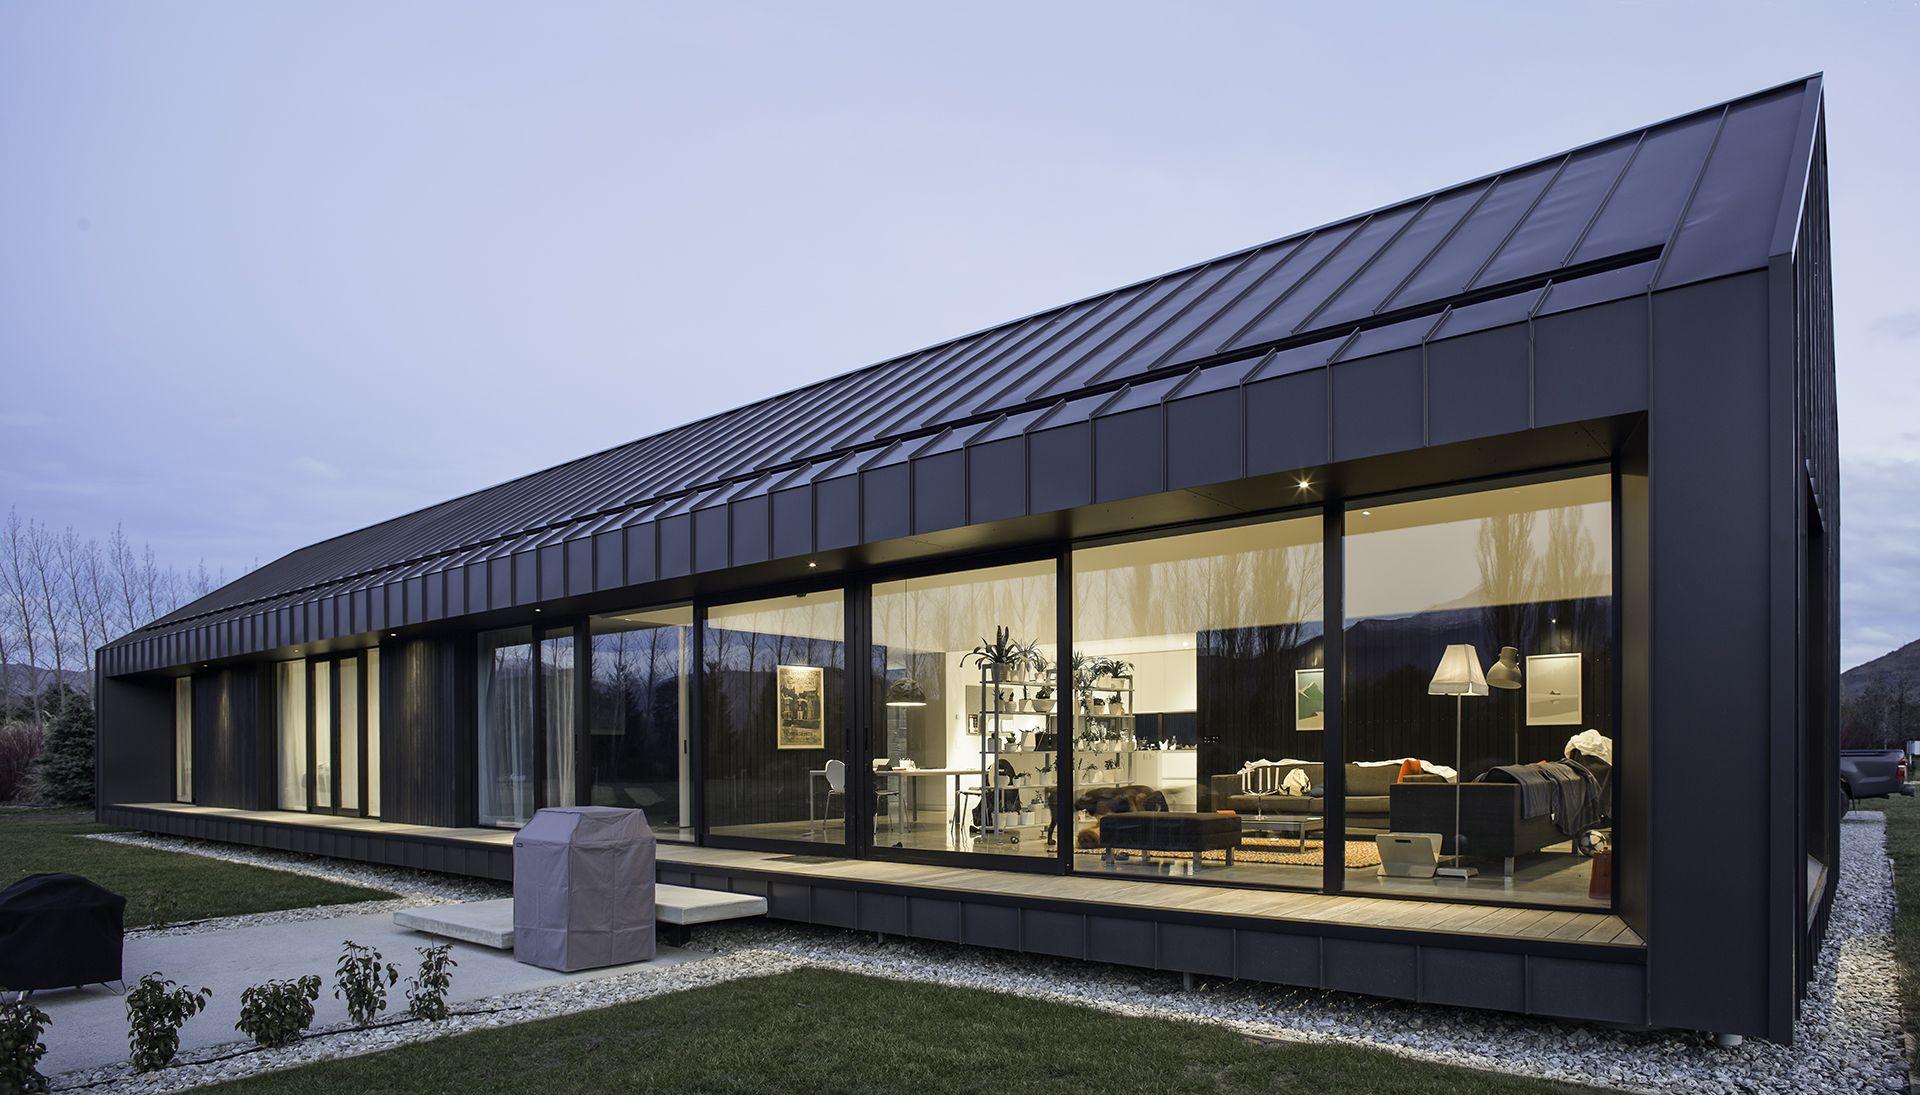 Ebbinge House Dravitzki Brown Architecture Roof Cladding Modern Barn House